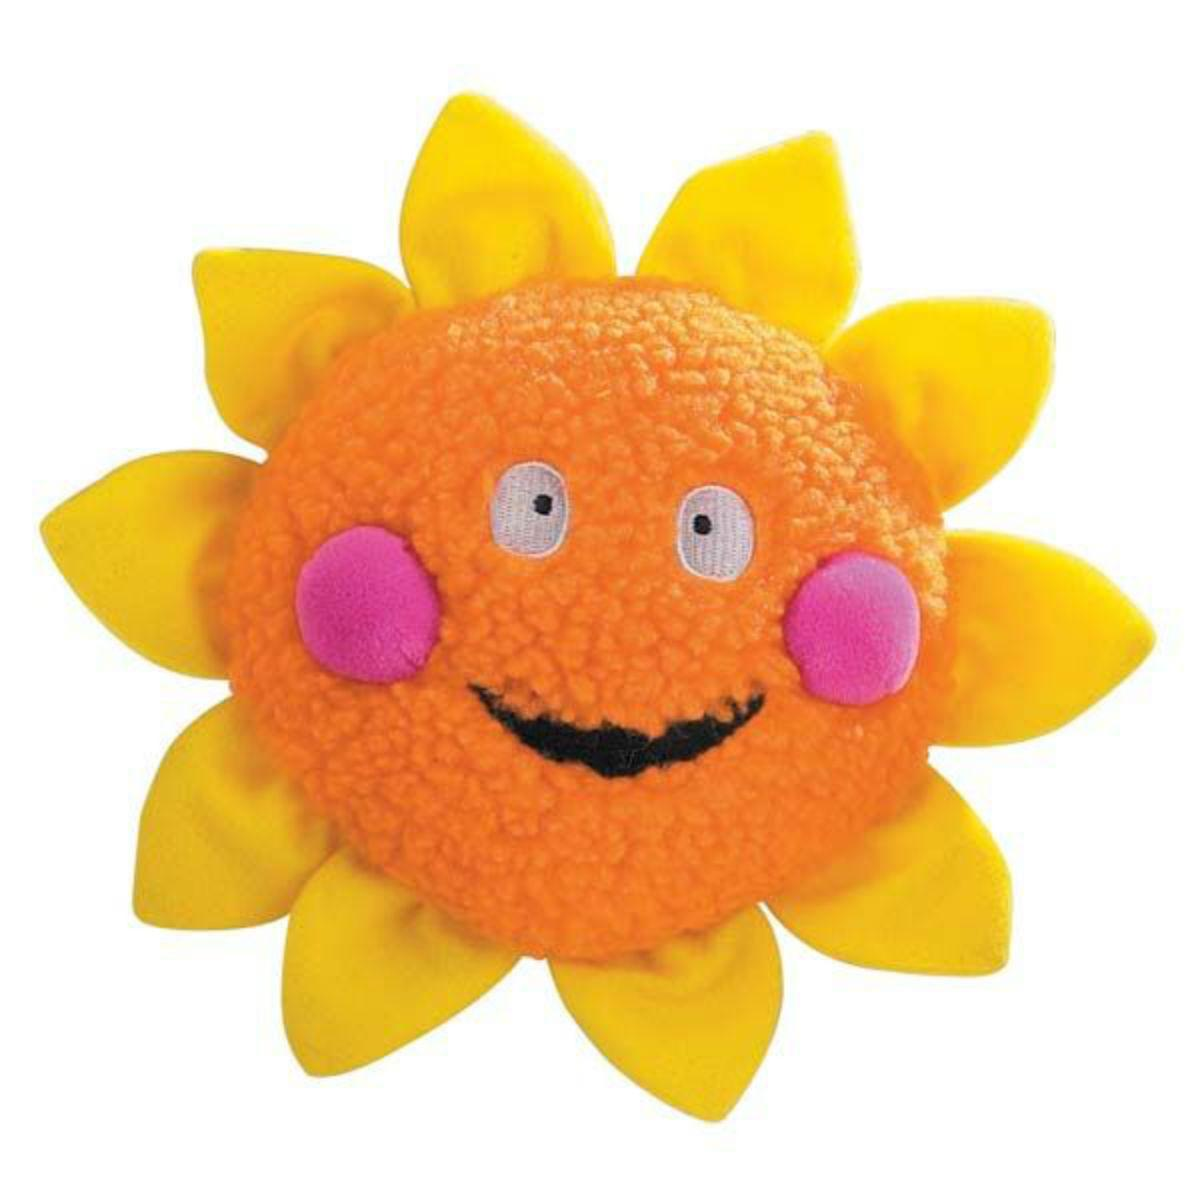 Zanies Celestial Smiles Dog Toy - Sun